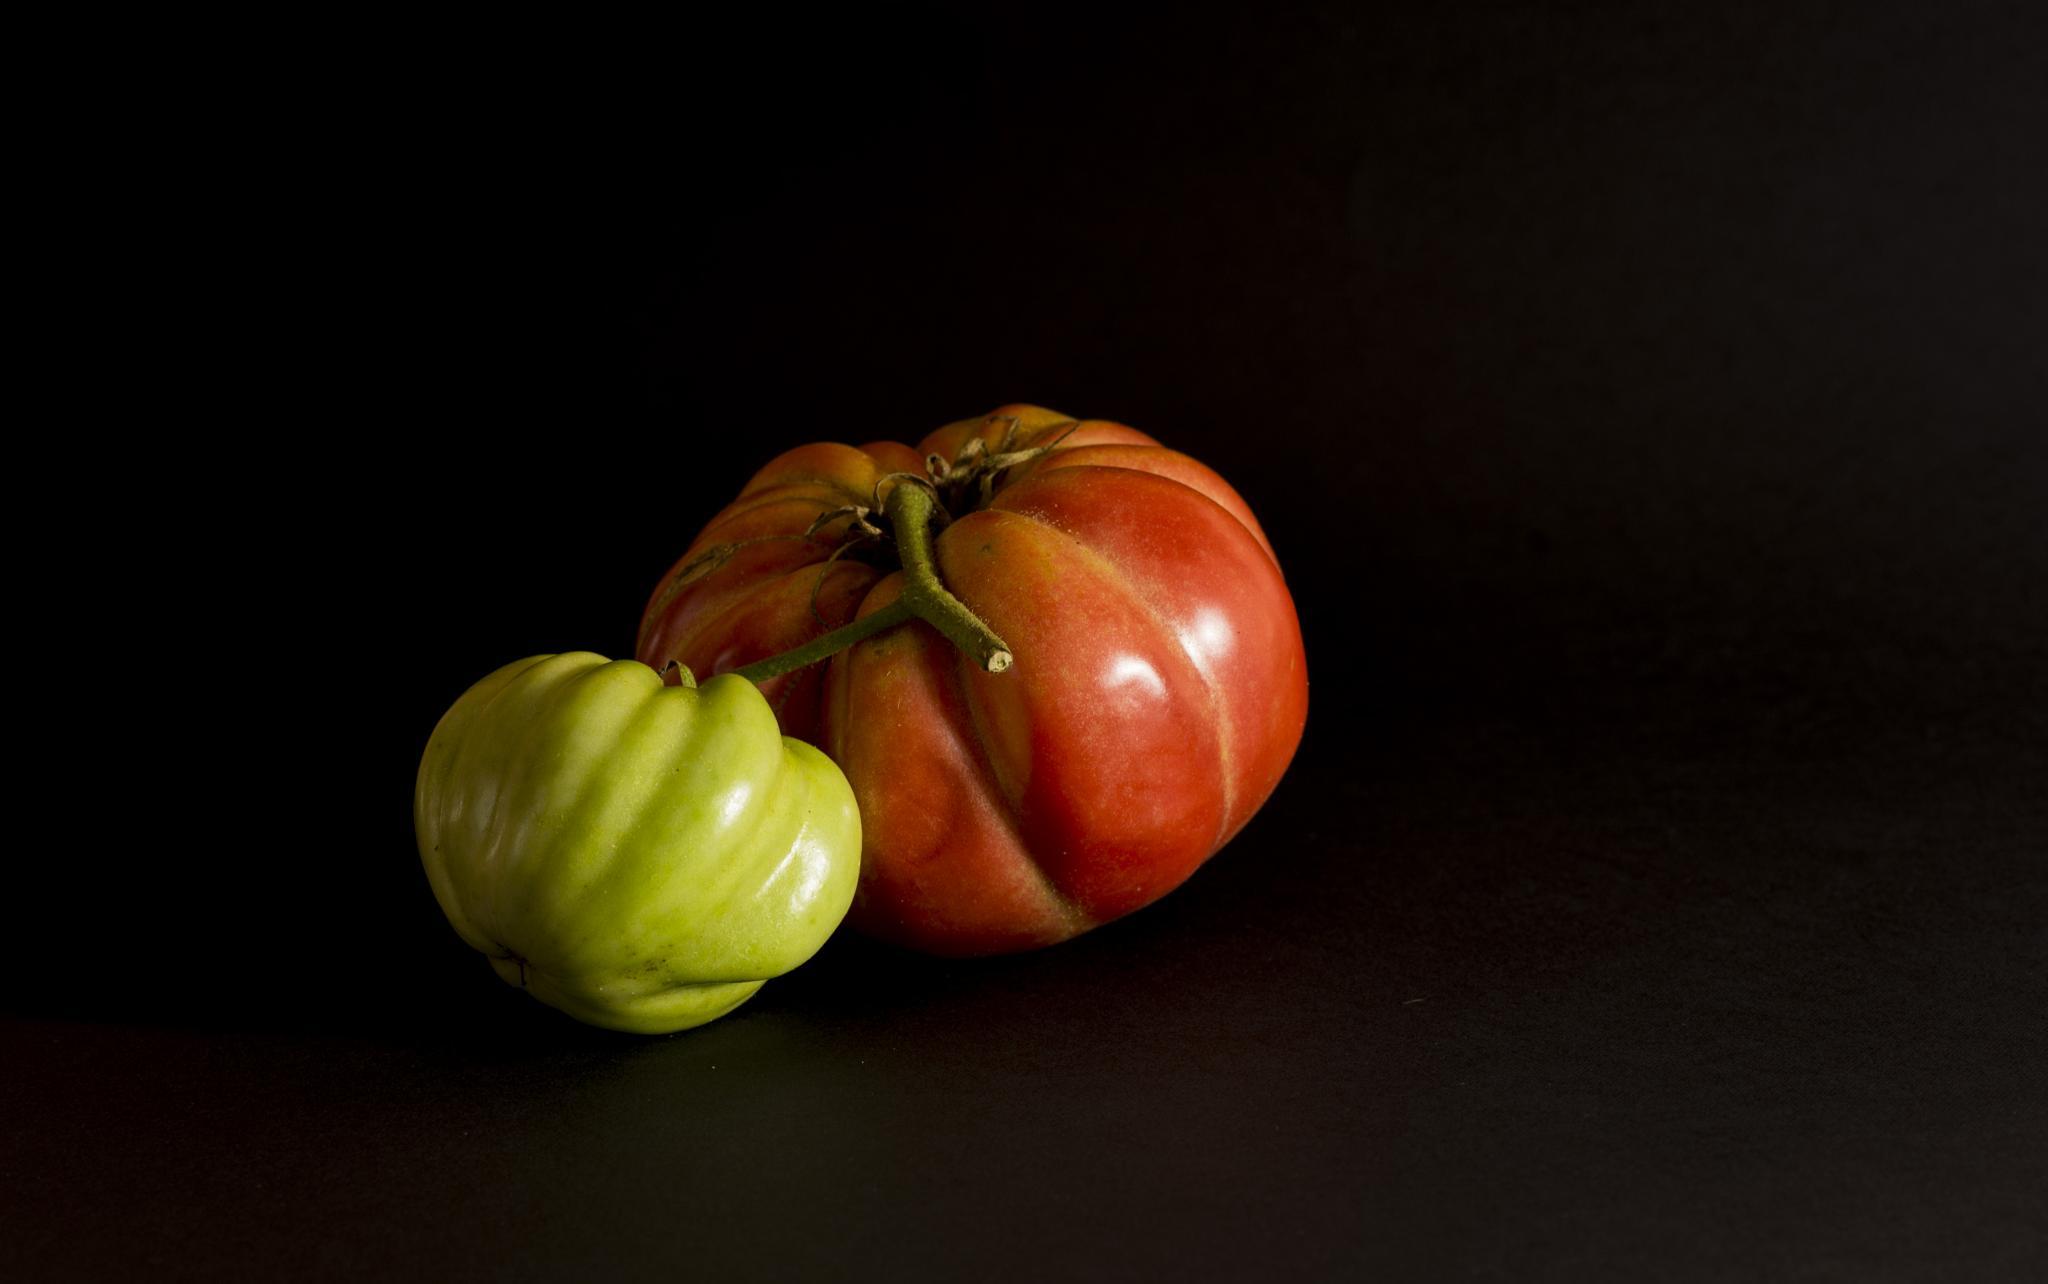 Tomatoes by NicoSebaste